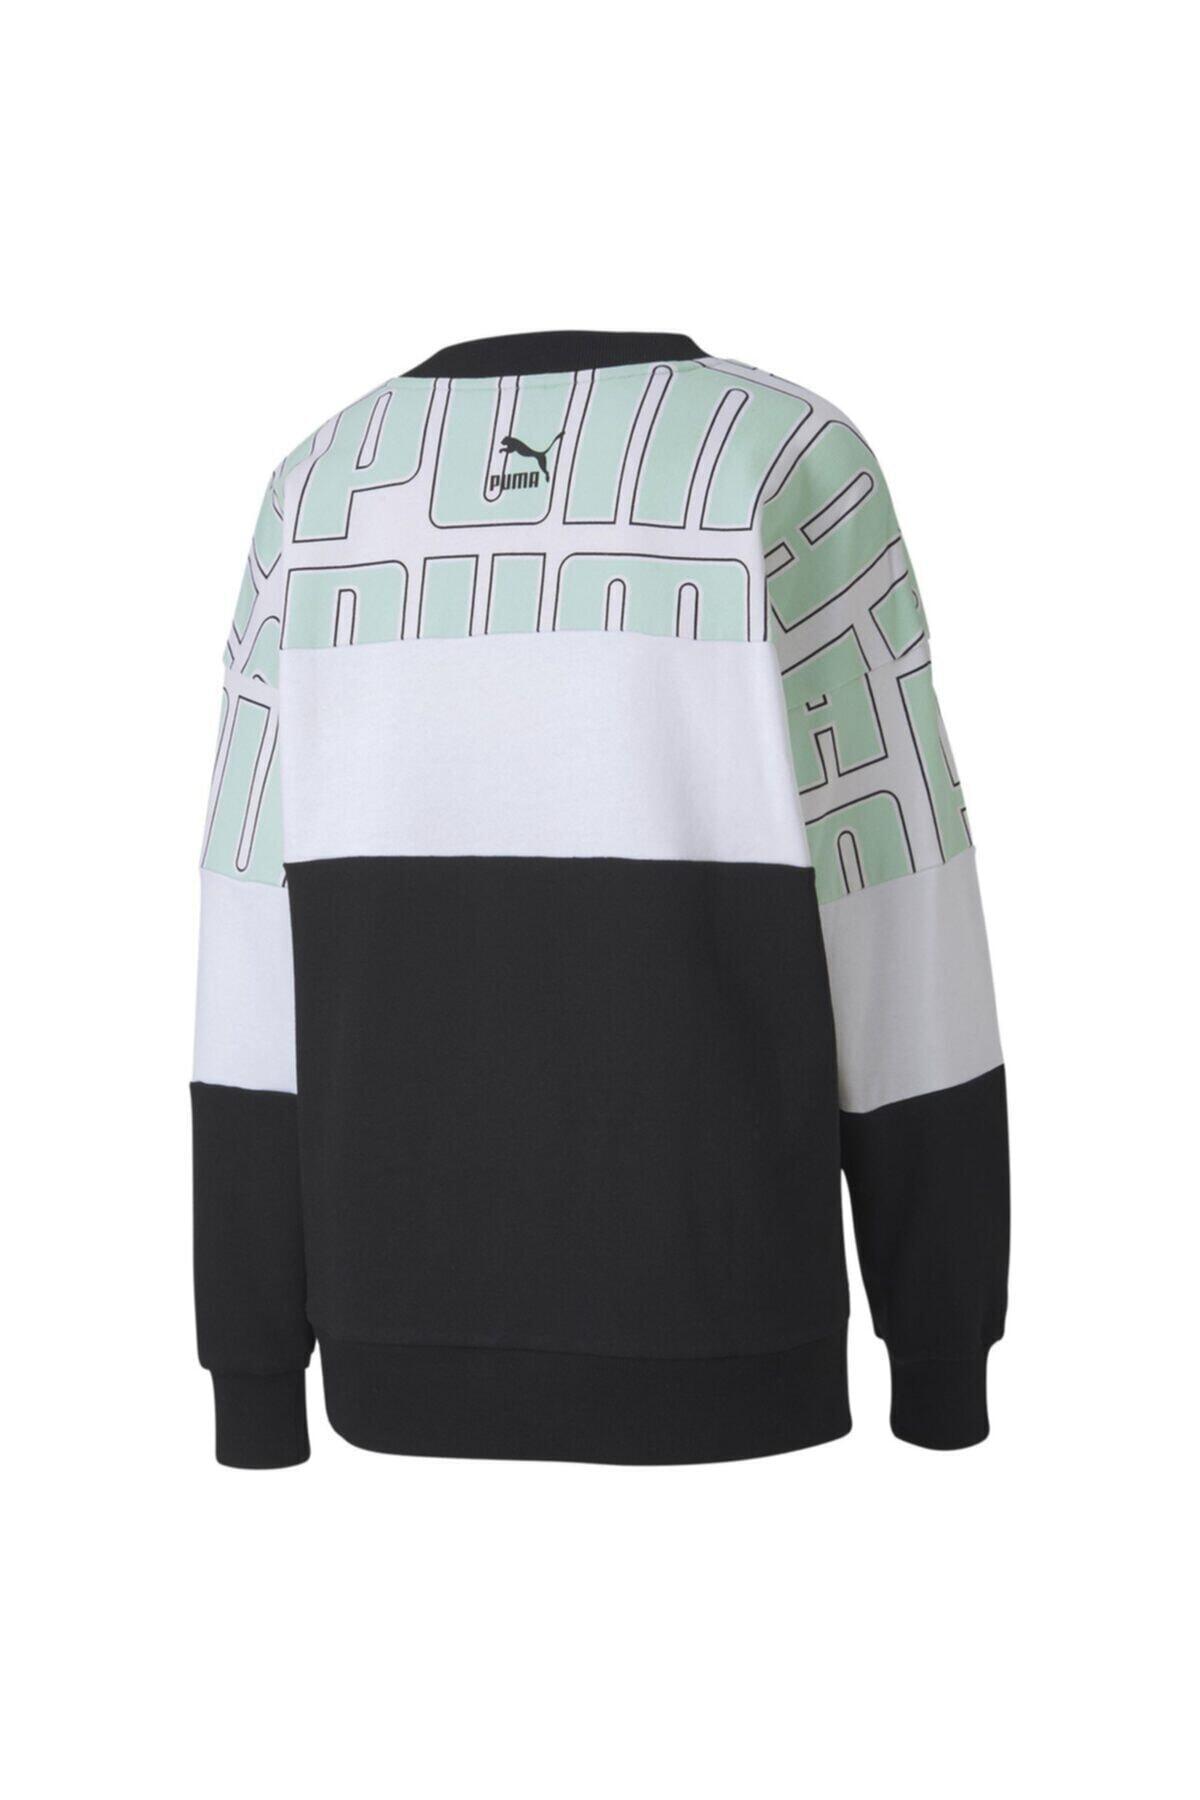 Puma Aop Crew Kadın Sweatshirt - 59625032 2